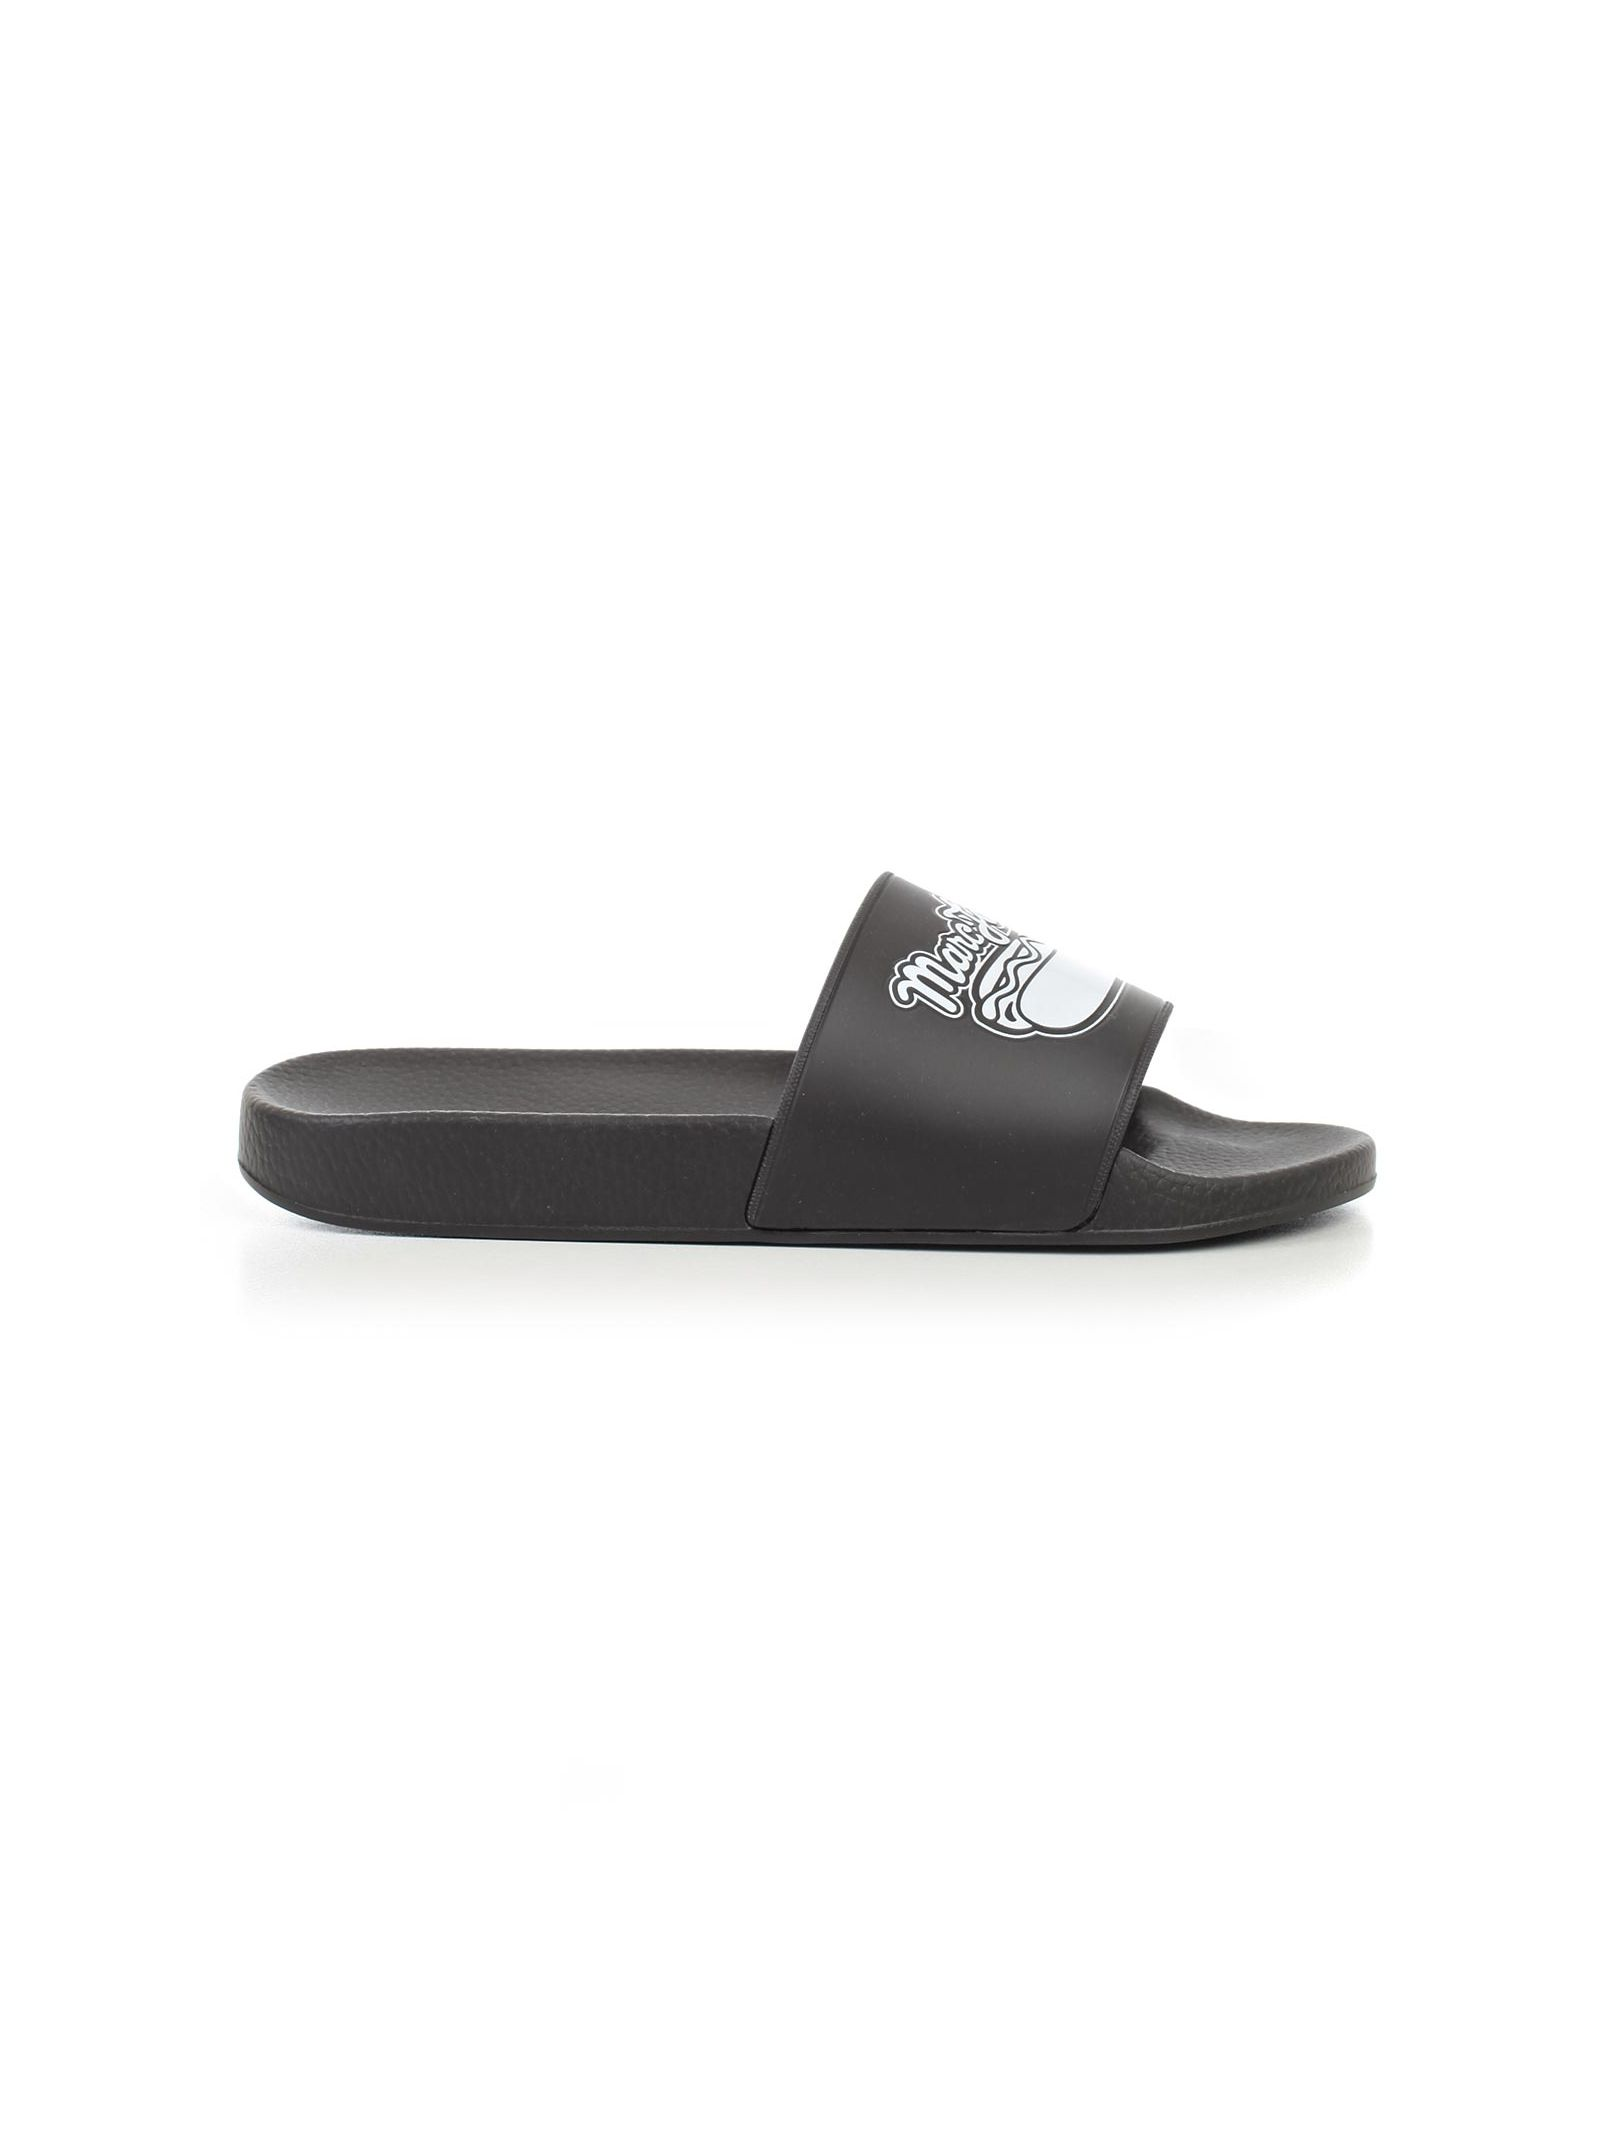 marc jacobs male marc jacobs shoes